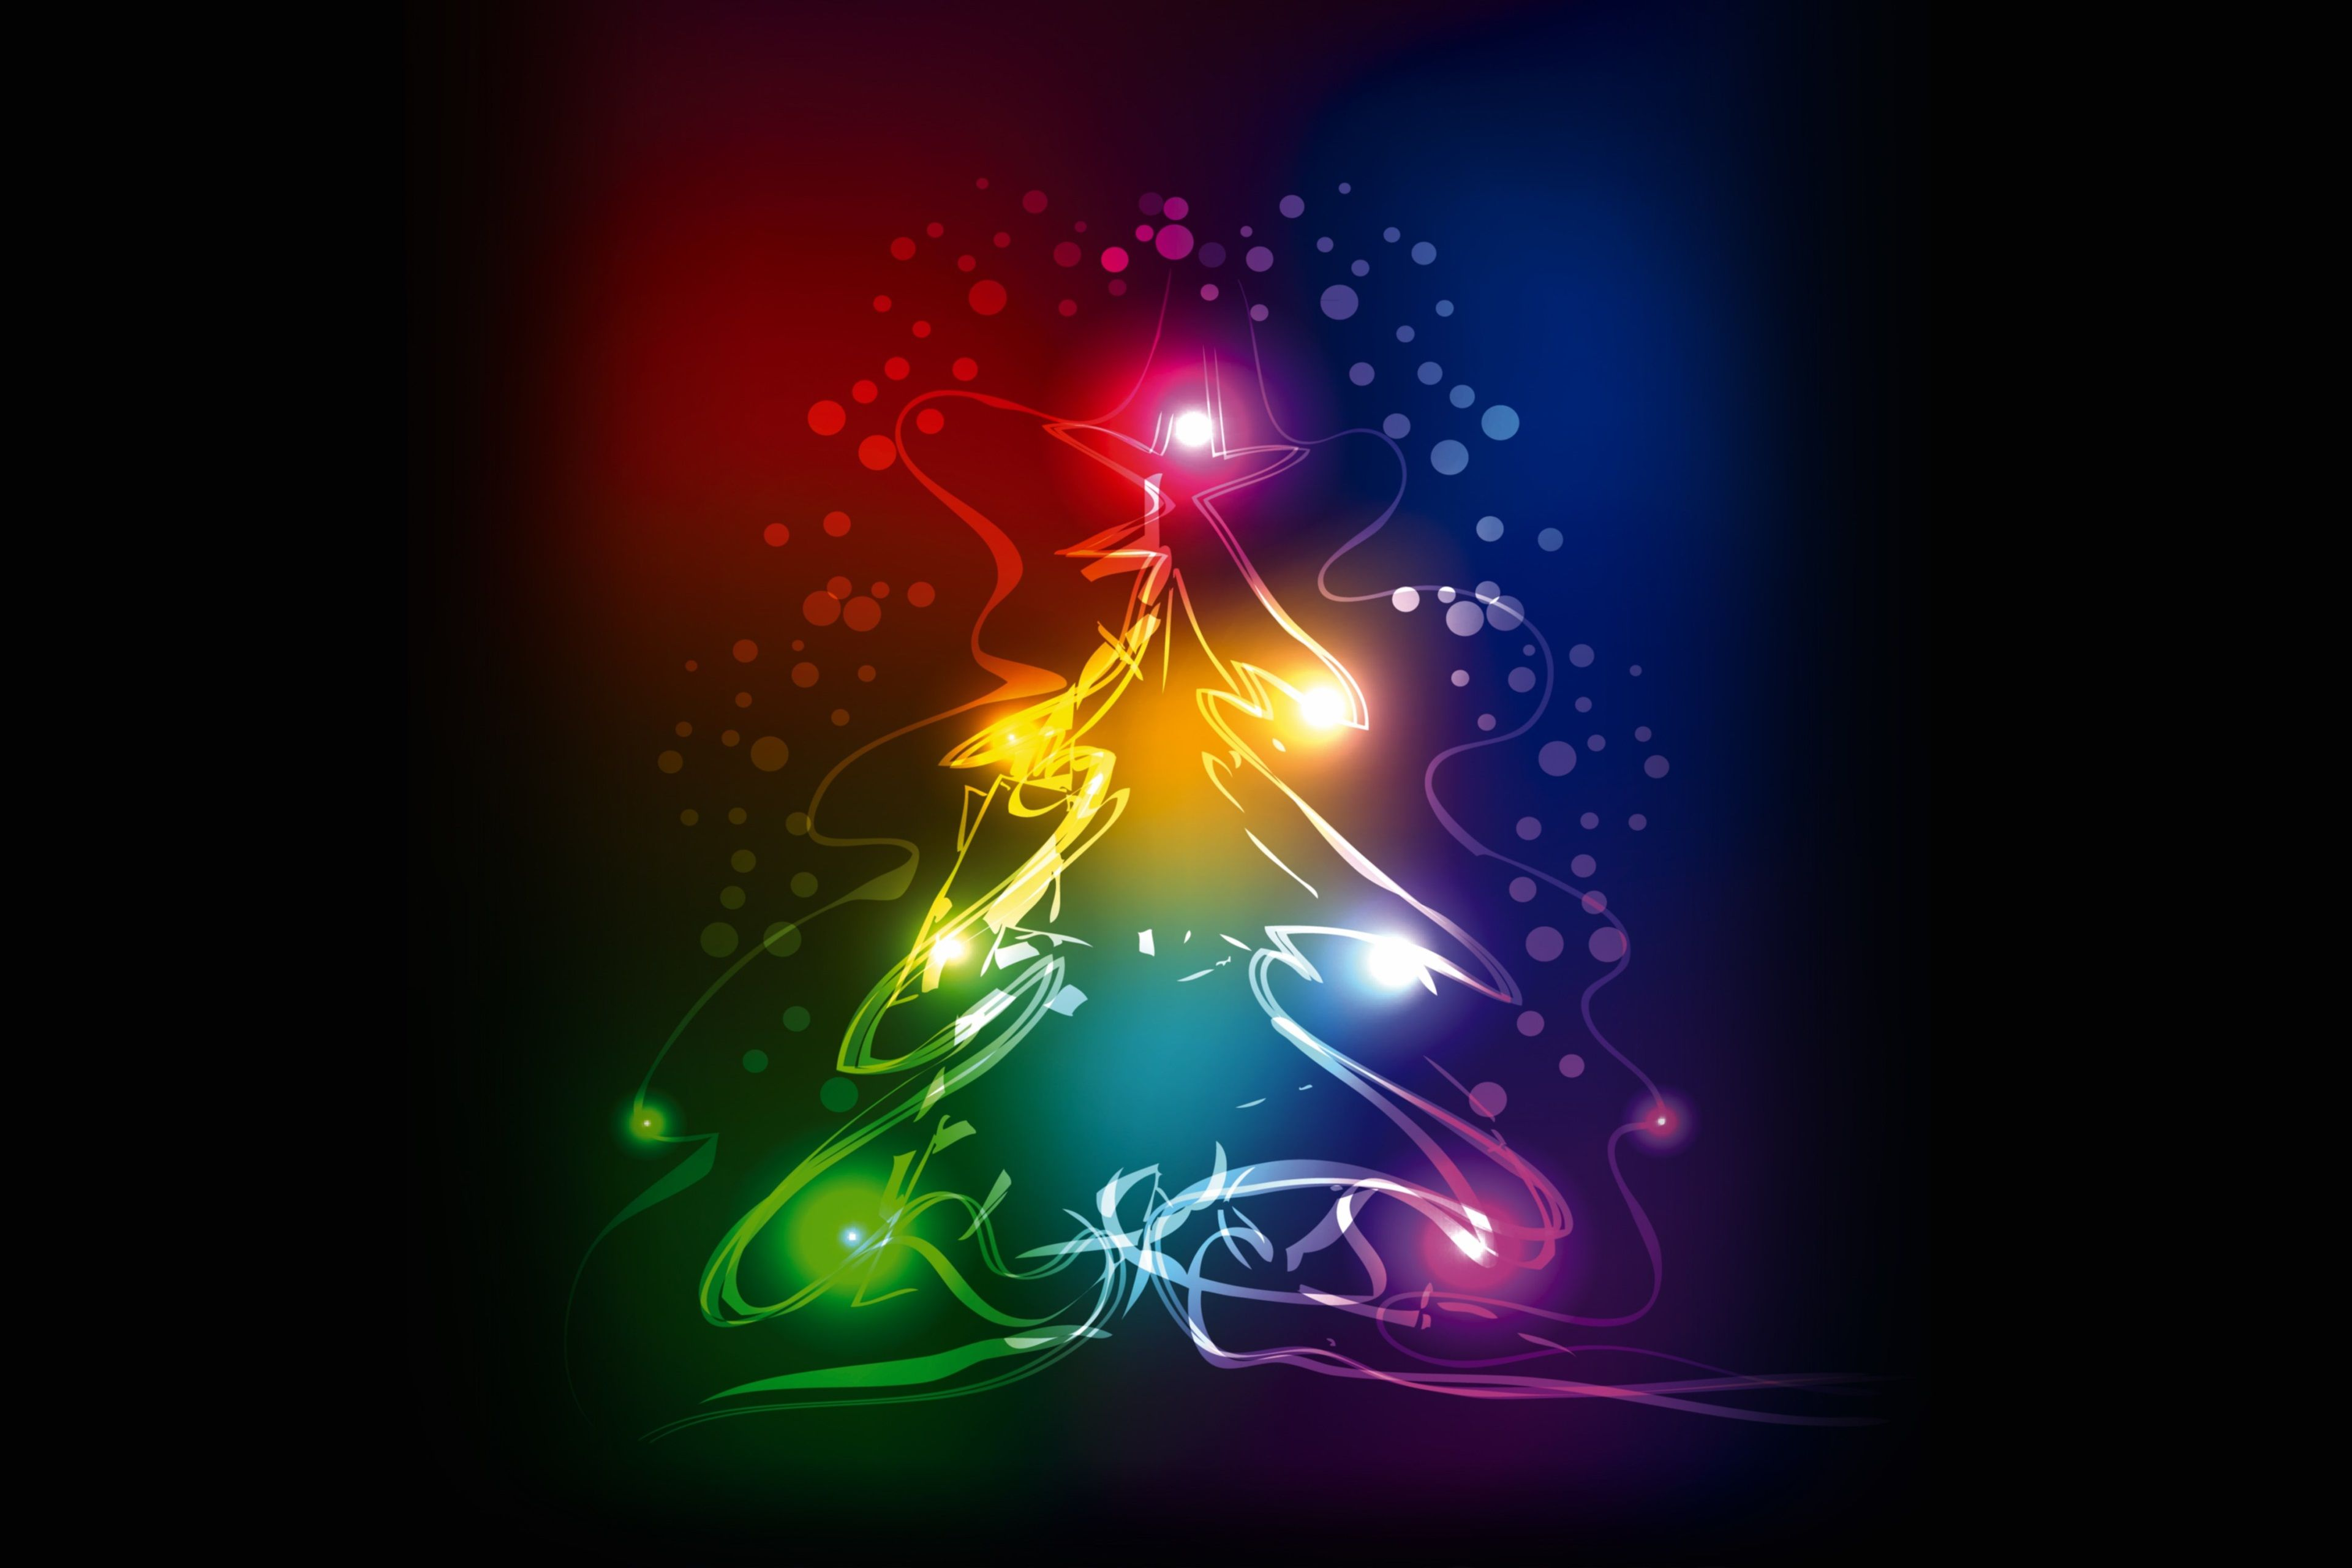 3840x2560 Christmas Tree 4k Pc Wallpaper Download Hd Christmas Wallpaper Backgrounds Wallpaper Iphone Christmas Free Christmas Wallpaper Downloads